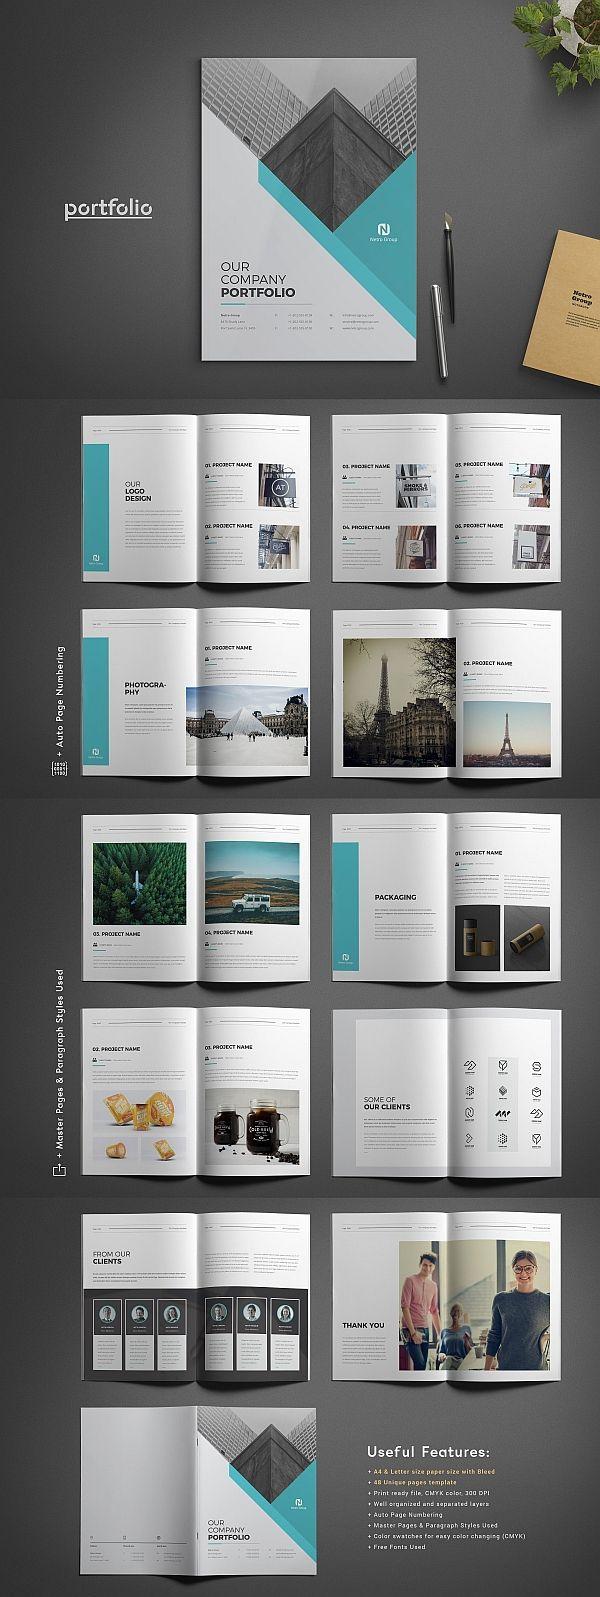 Company Portfolio Template #portfolio #lookbook #brochure #template #brochuretemplates #indesign #templates #layout #editorial #corporate #business